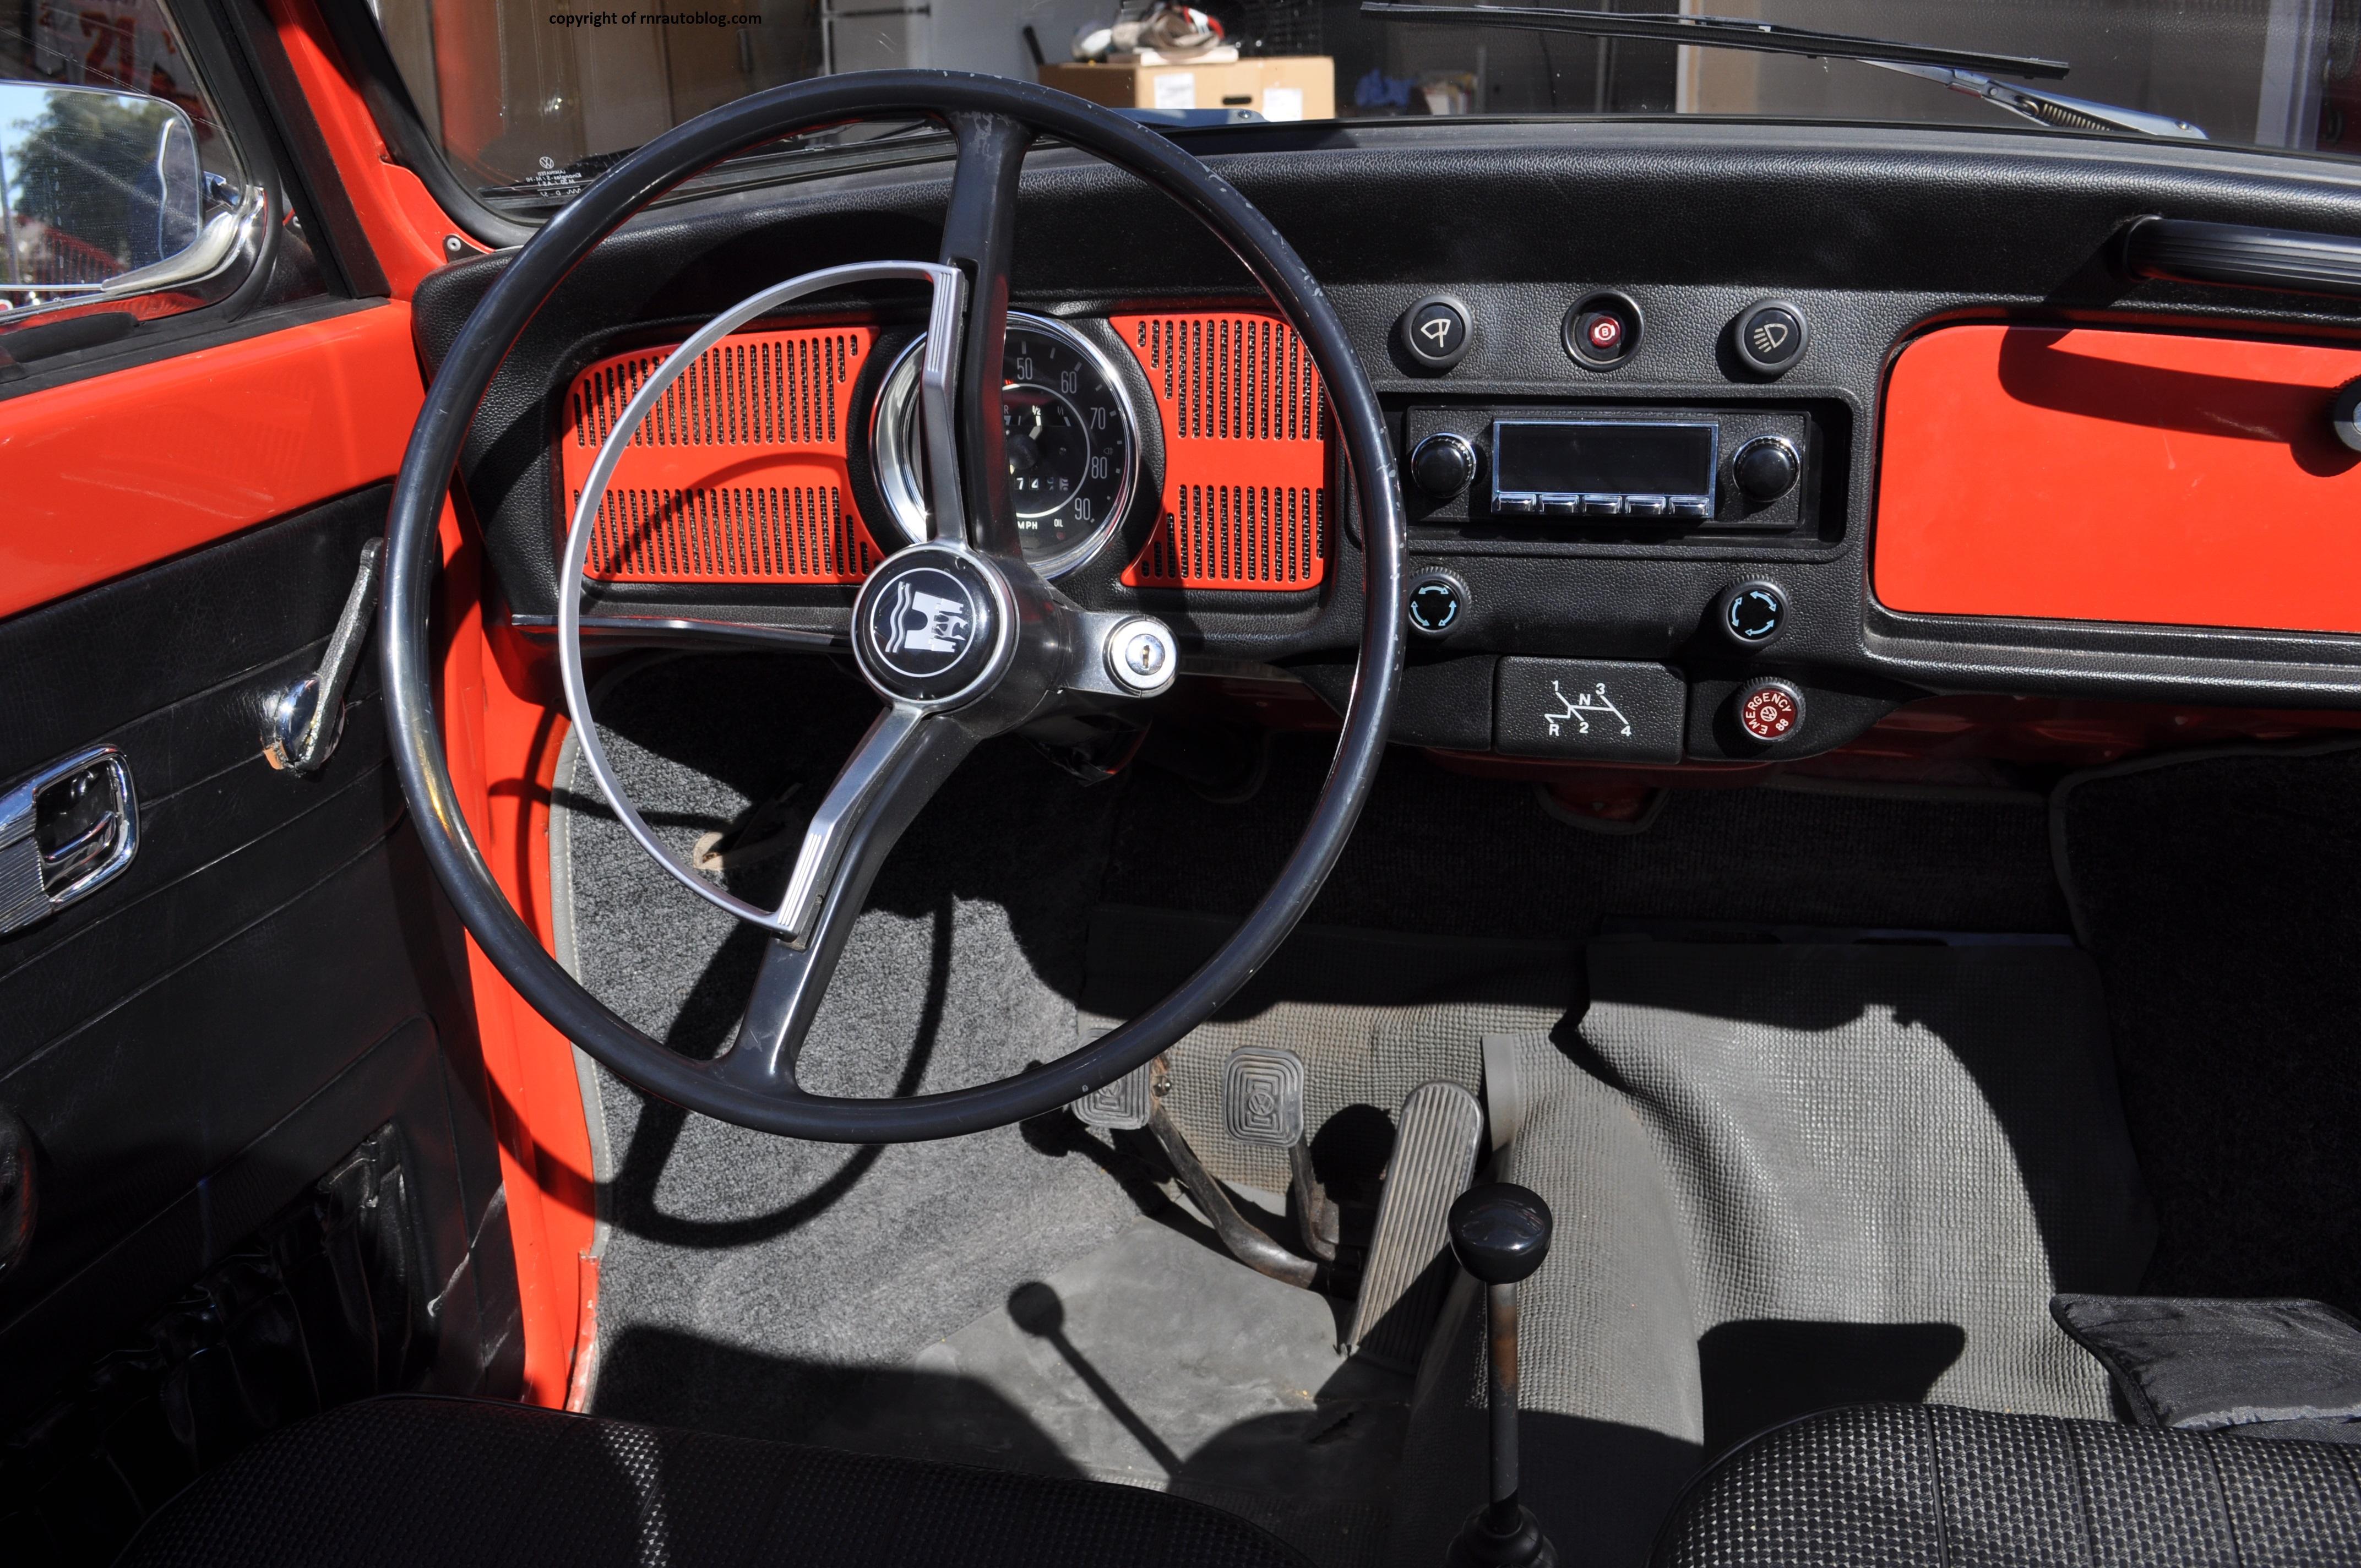 1969 volkswagen beetle convertible review rnr automotive blog. Black Bedroom Furniture Sets. Home Design Ideas